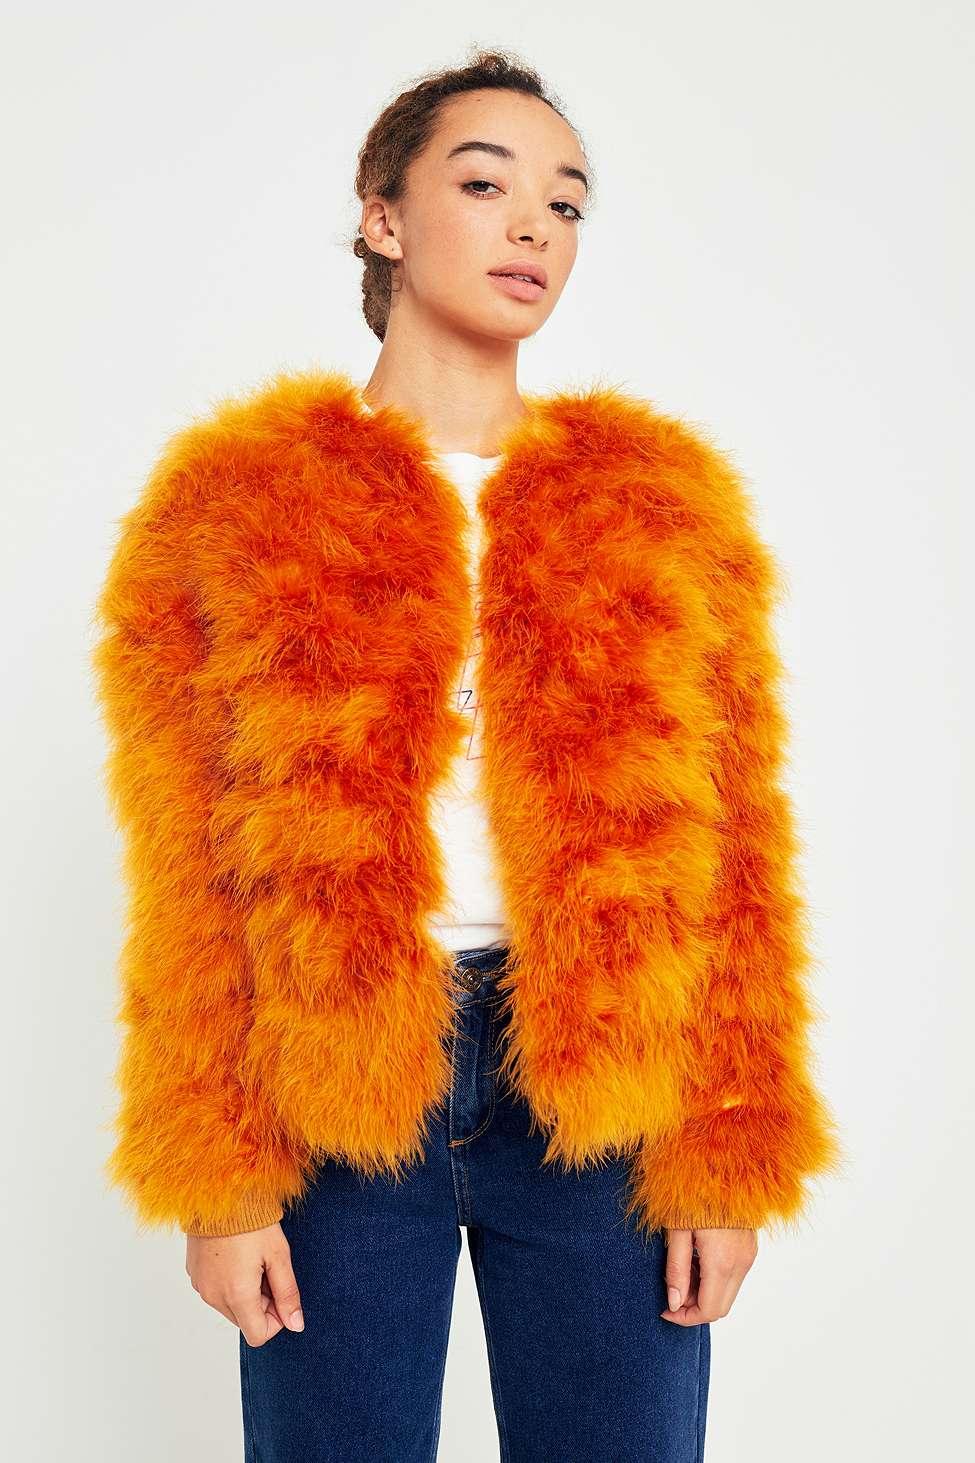 Light Before Dark Orange Marabou Faux Fur Jacket, Orange